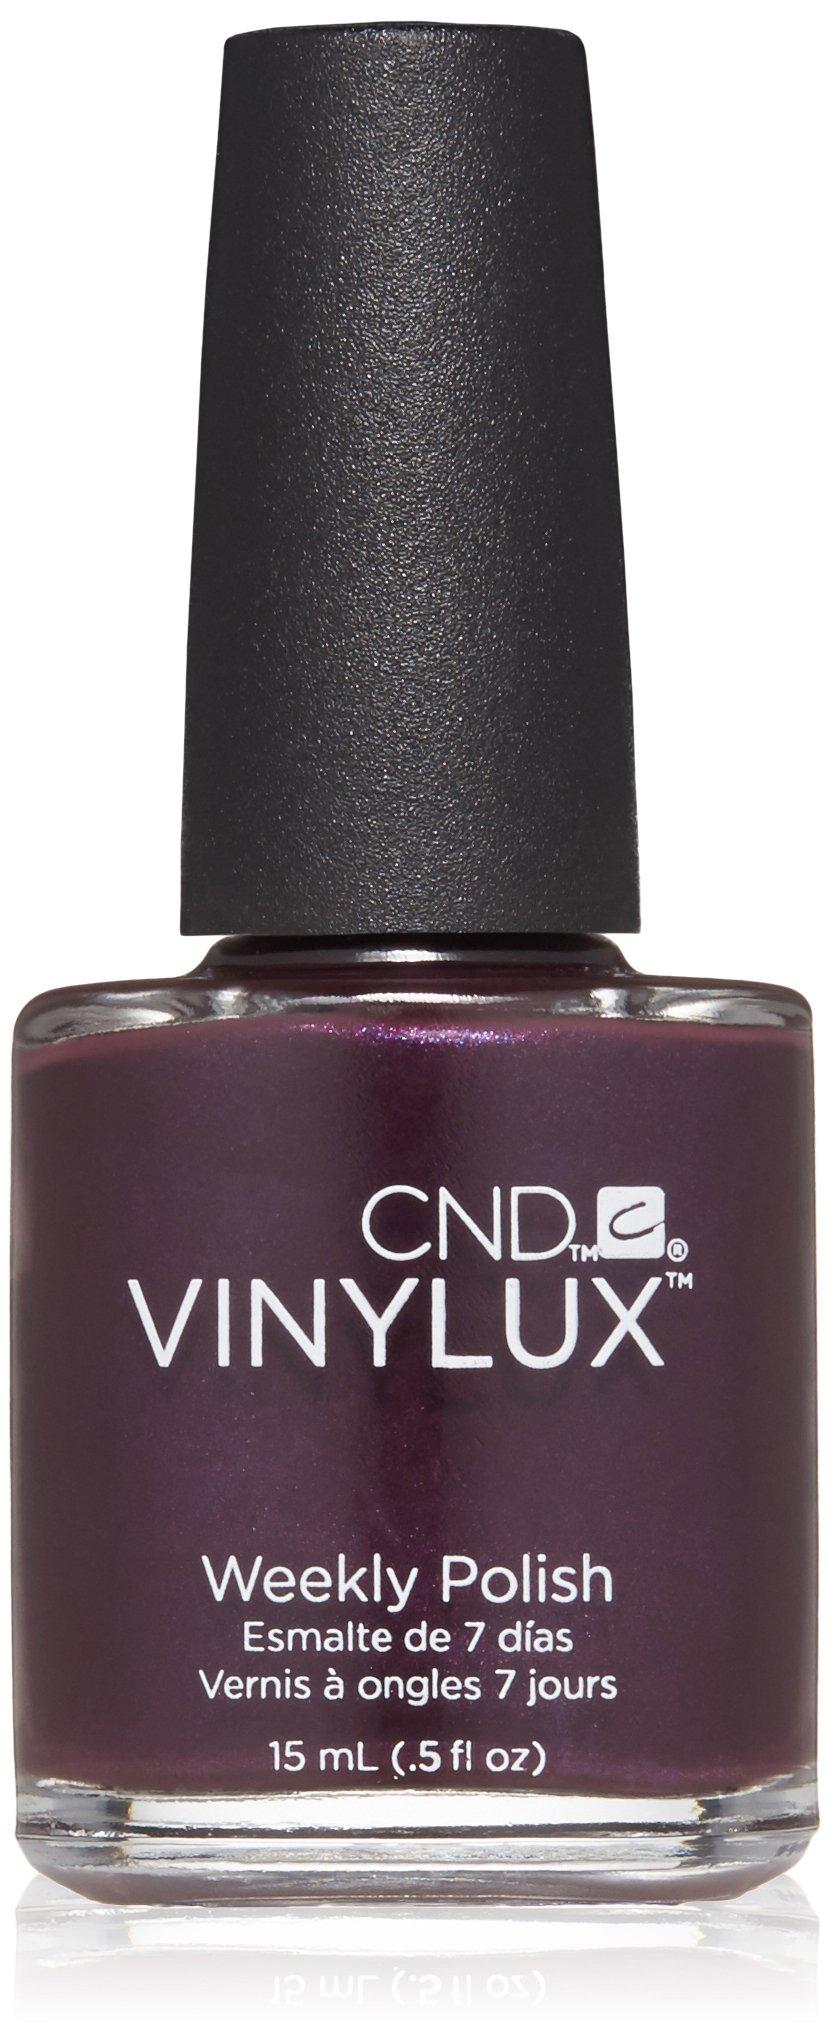 Amazon.com: CND Vinylux Weekly Nail Polish, Crimson Sash, 0.5 fl. oz.: Luxury Beauty